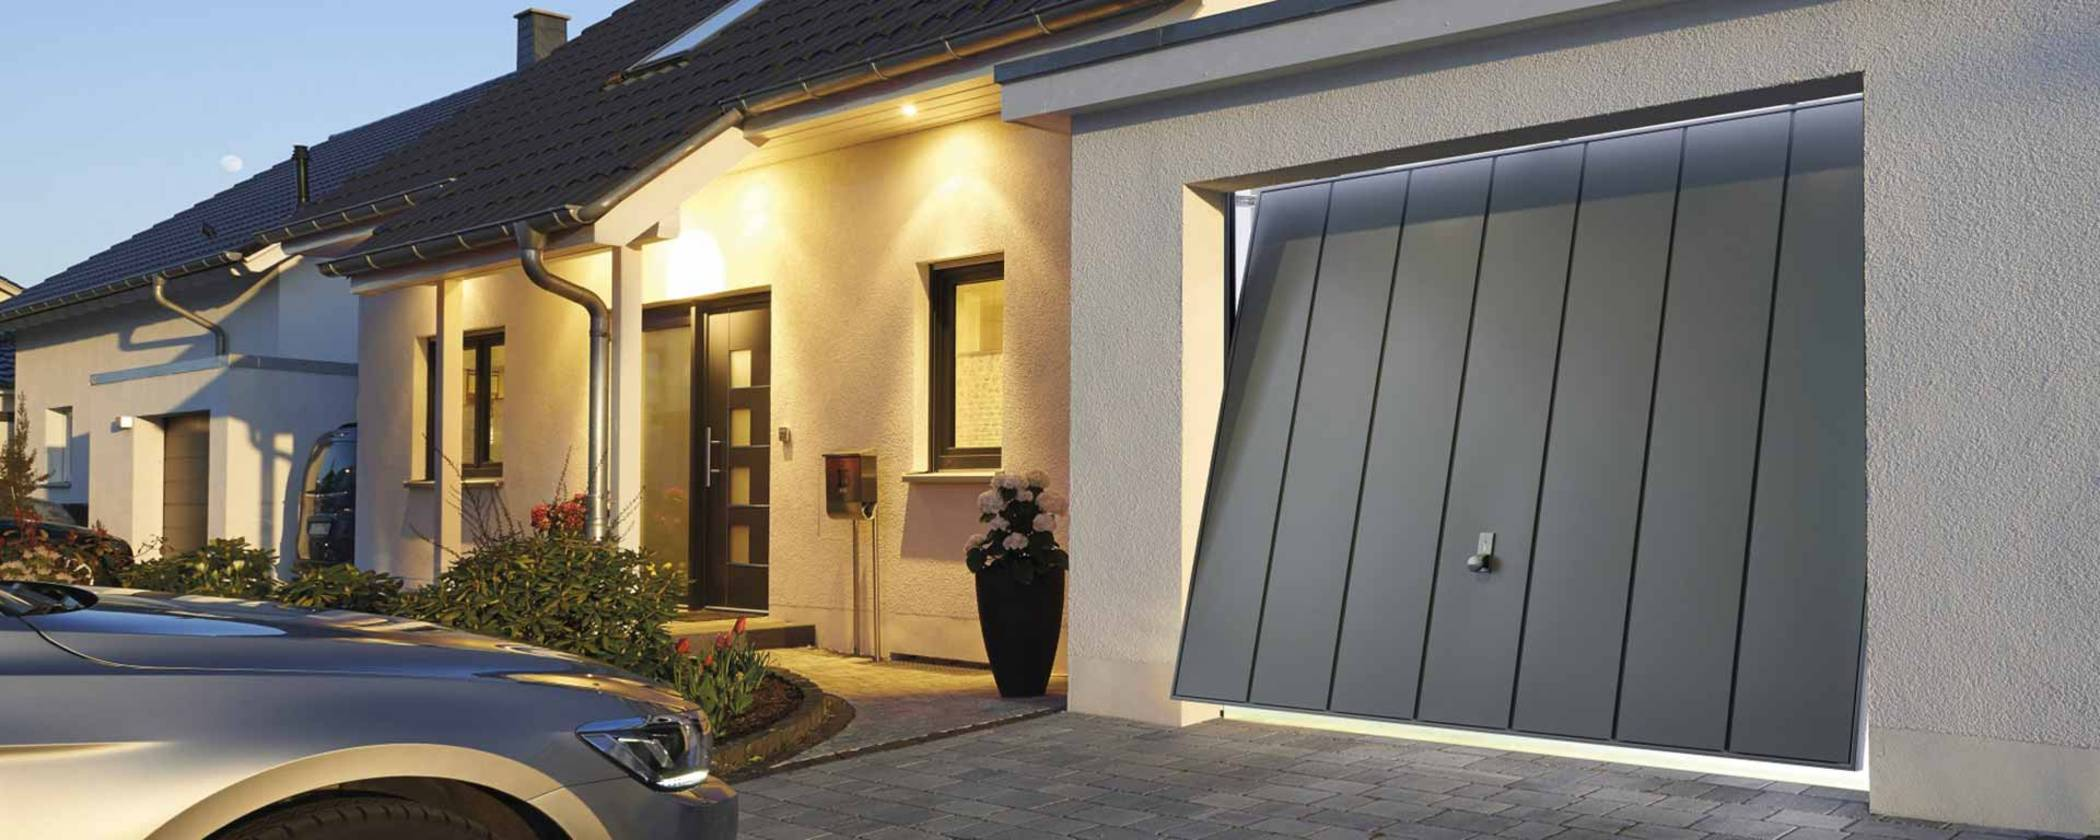 Vente de porte de garage basculante